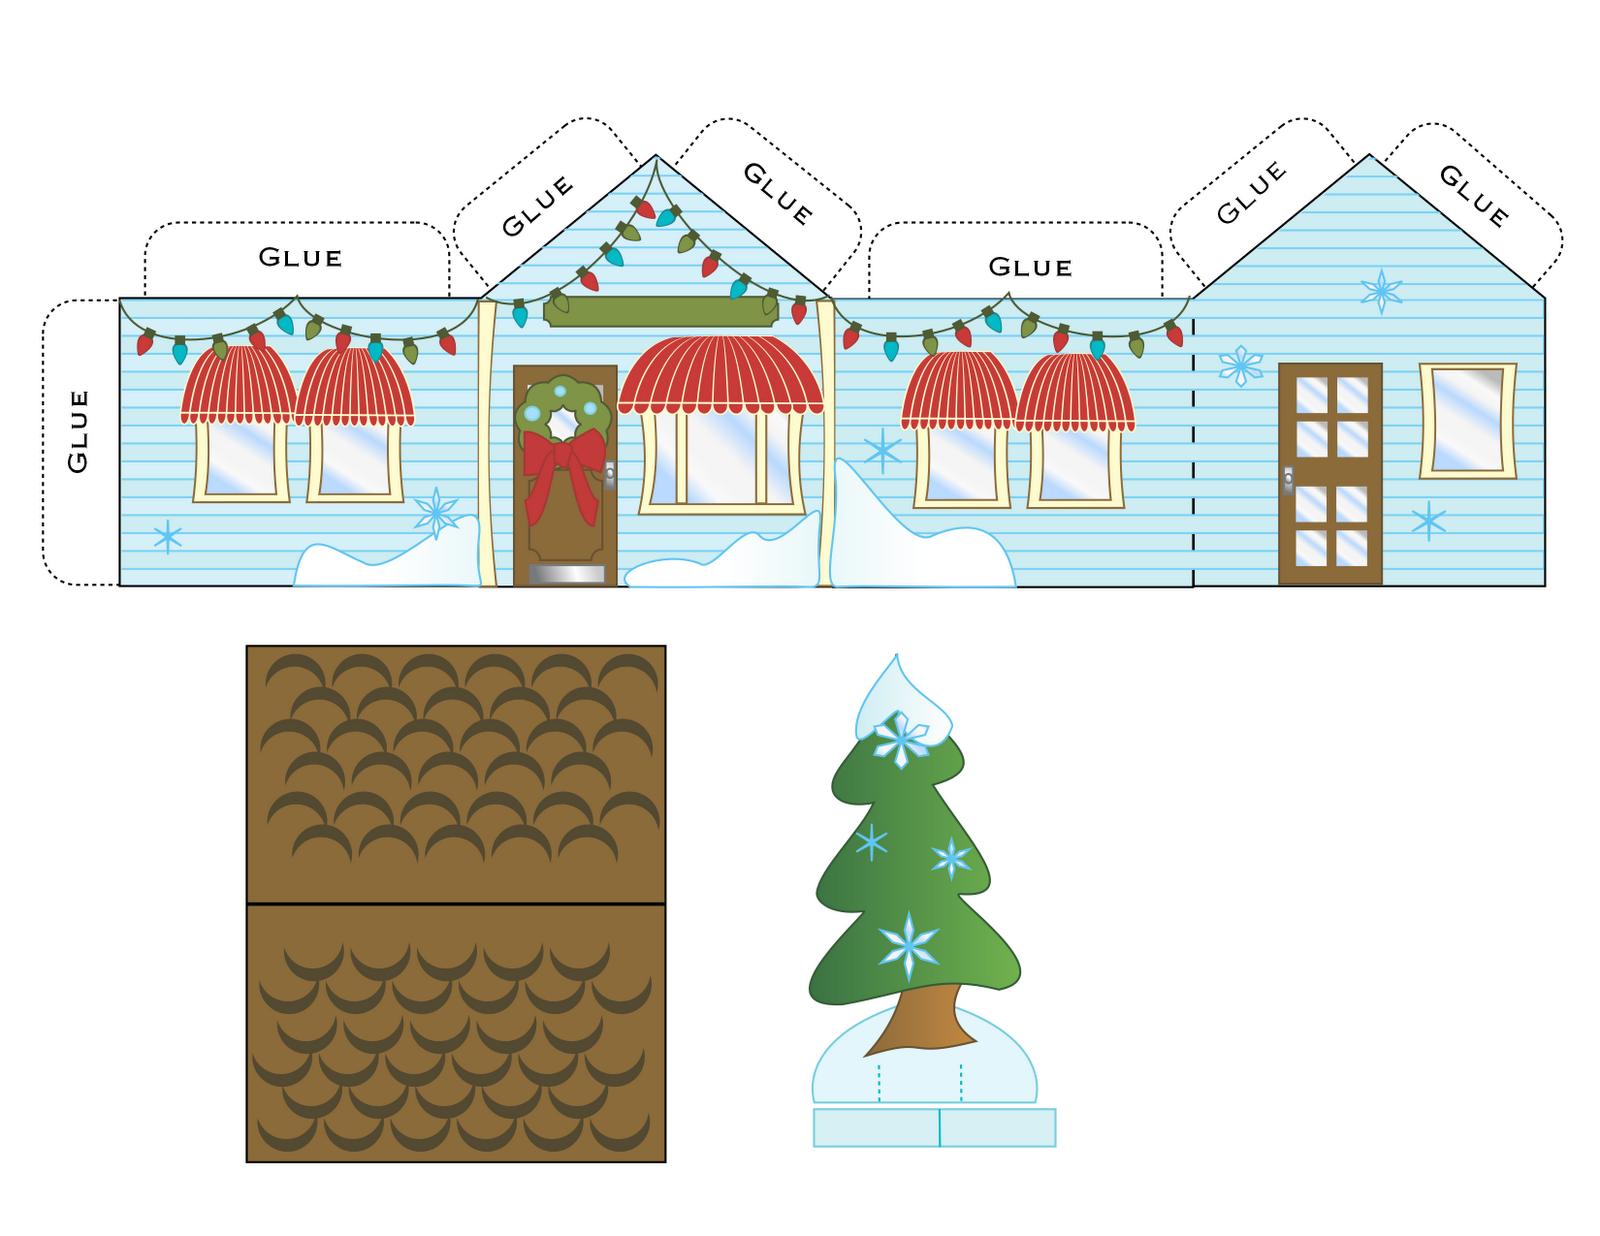 ... Ann Bakes: FREE Christmas Printables, Gift Tags & Homemade Gift Ideas